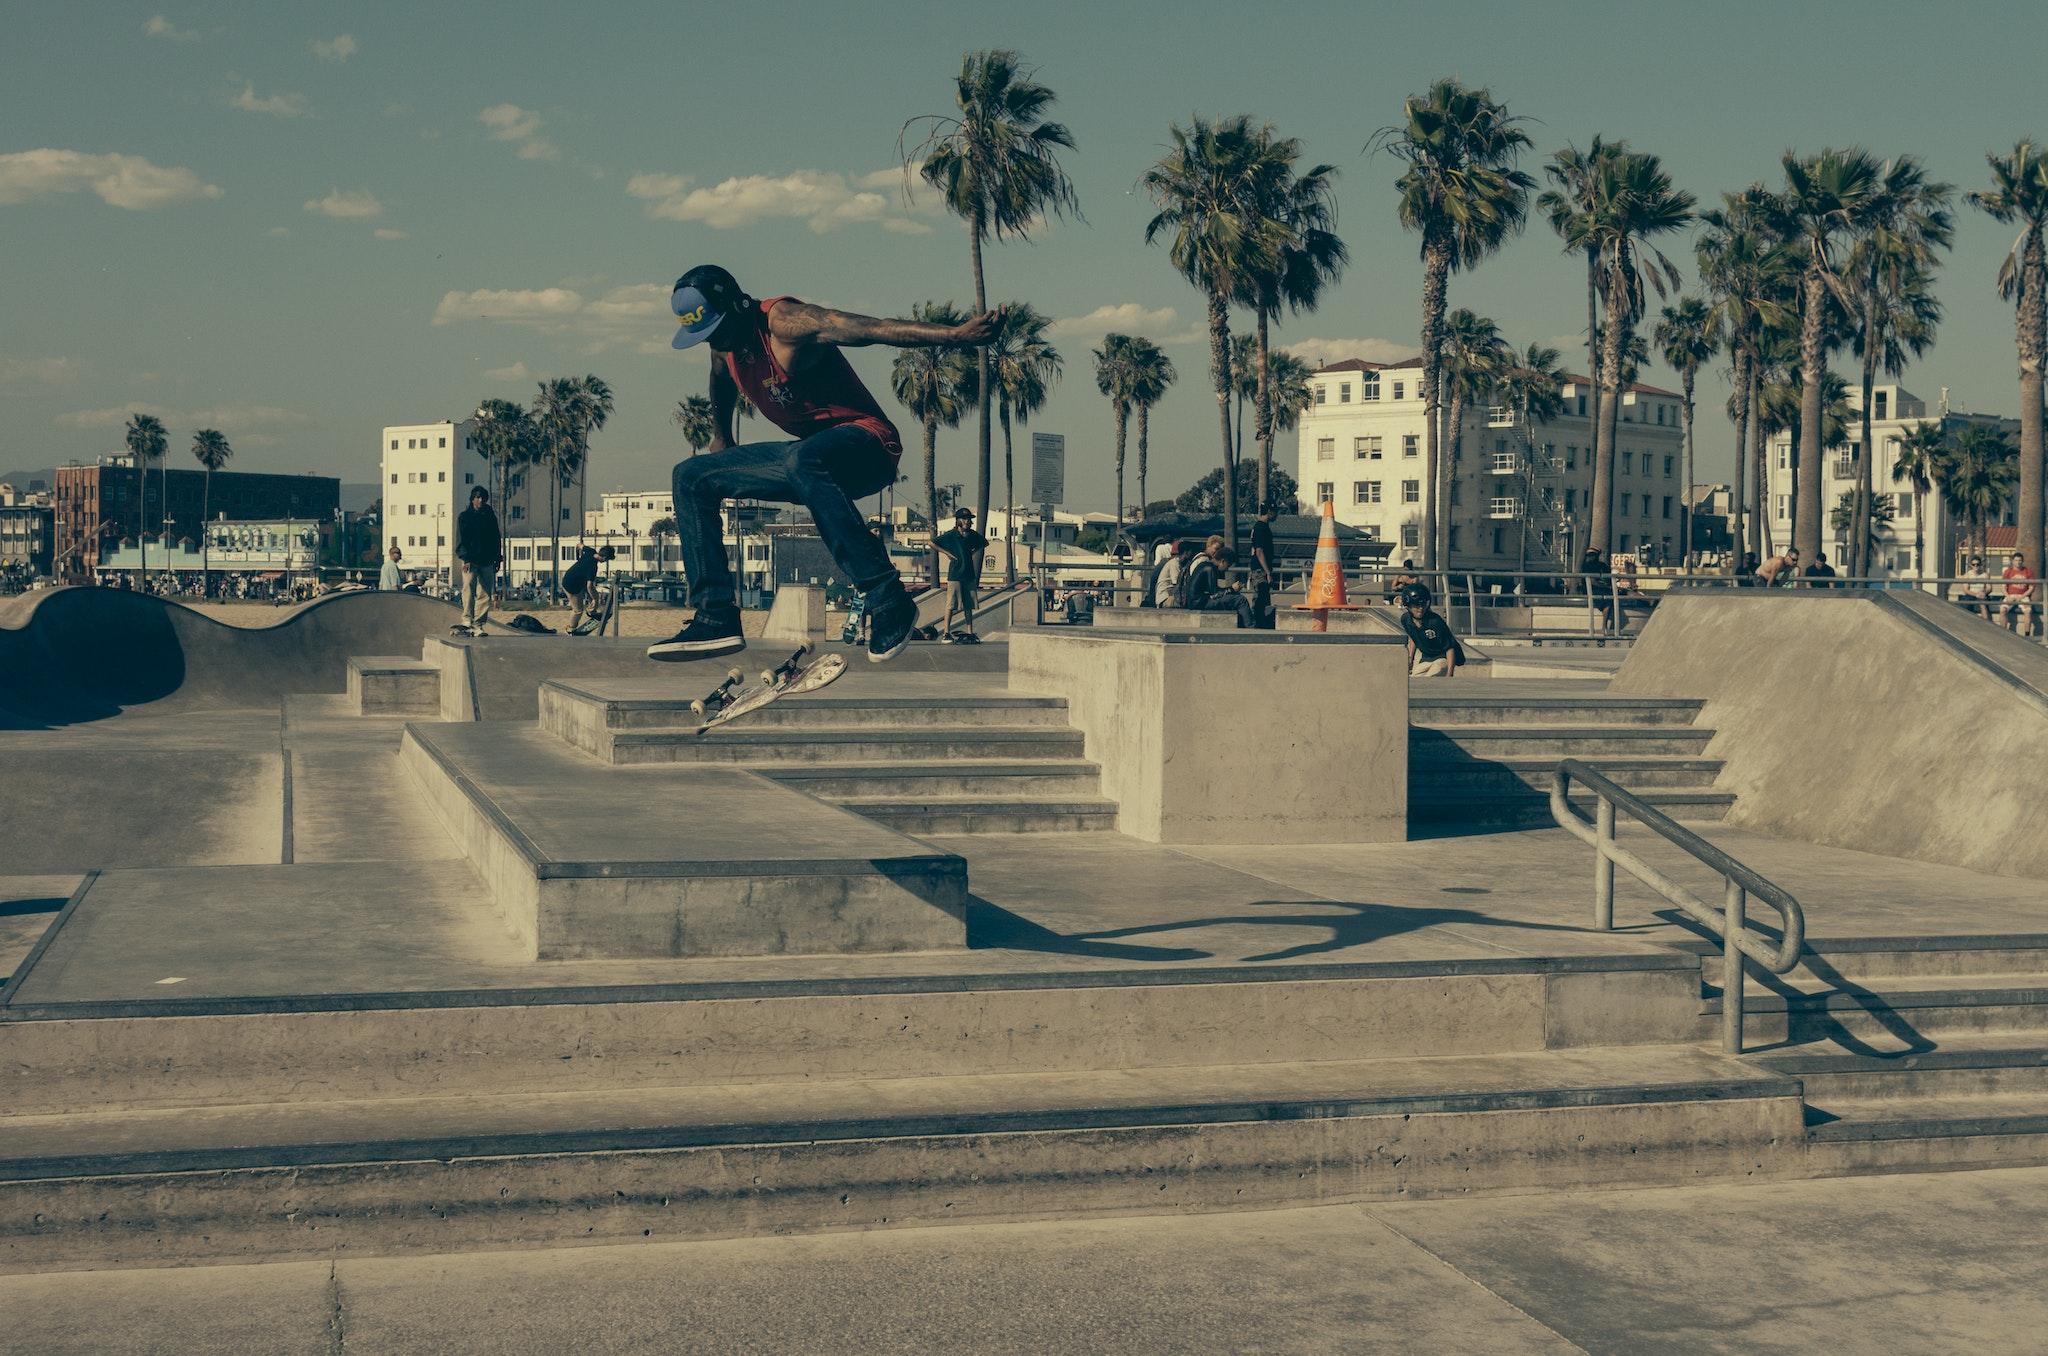 Skateboarder.jpg?w=2048&h=900&fit=crop&crop=focalpoint&fp x=.4&fp y=